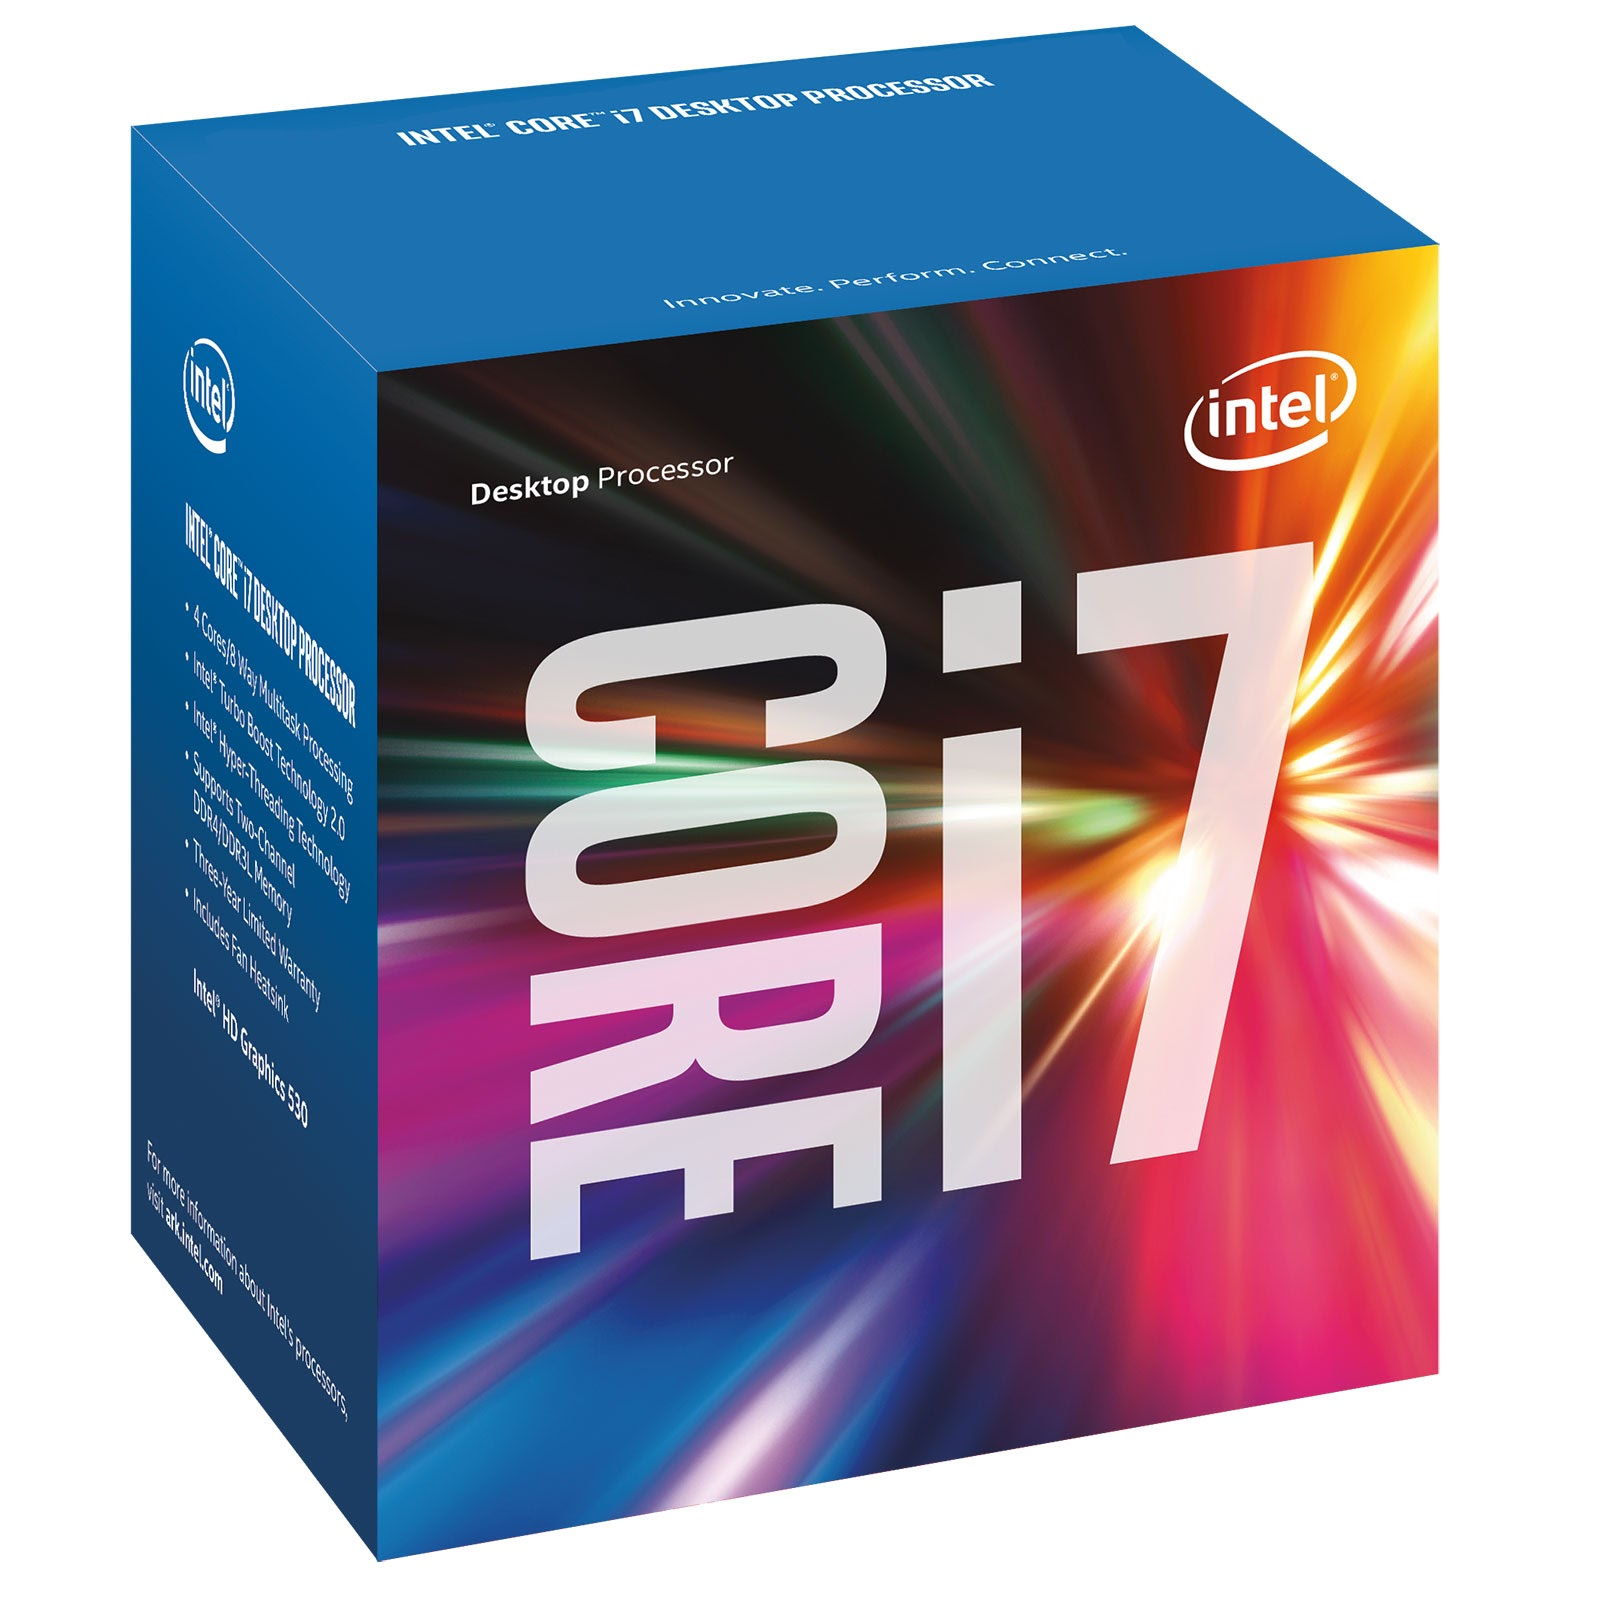 Intel Core i7 Skylake s1151